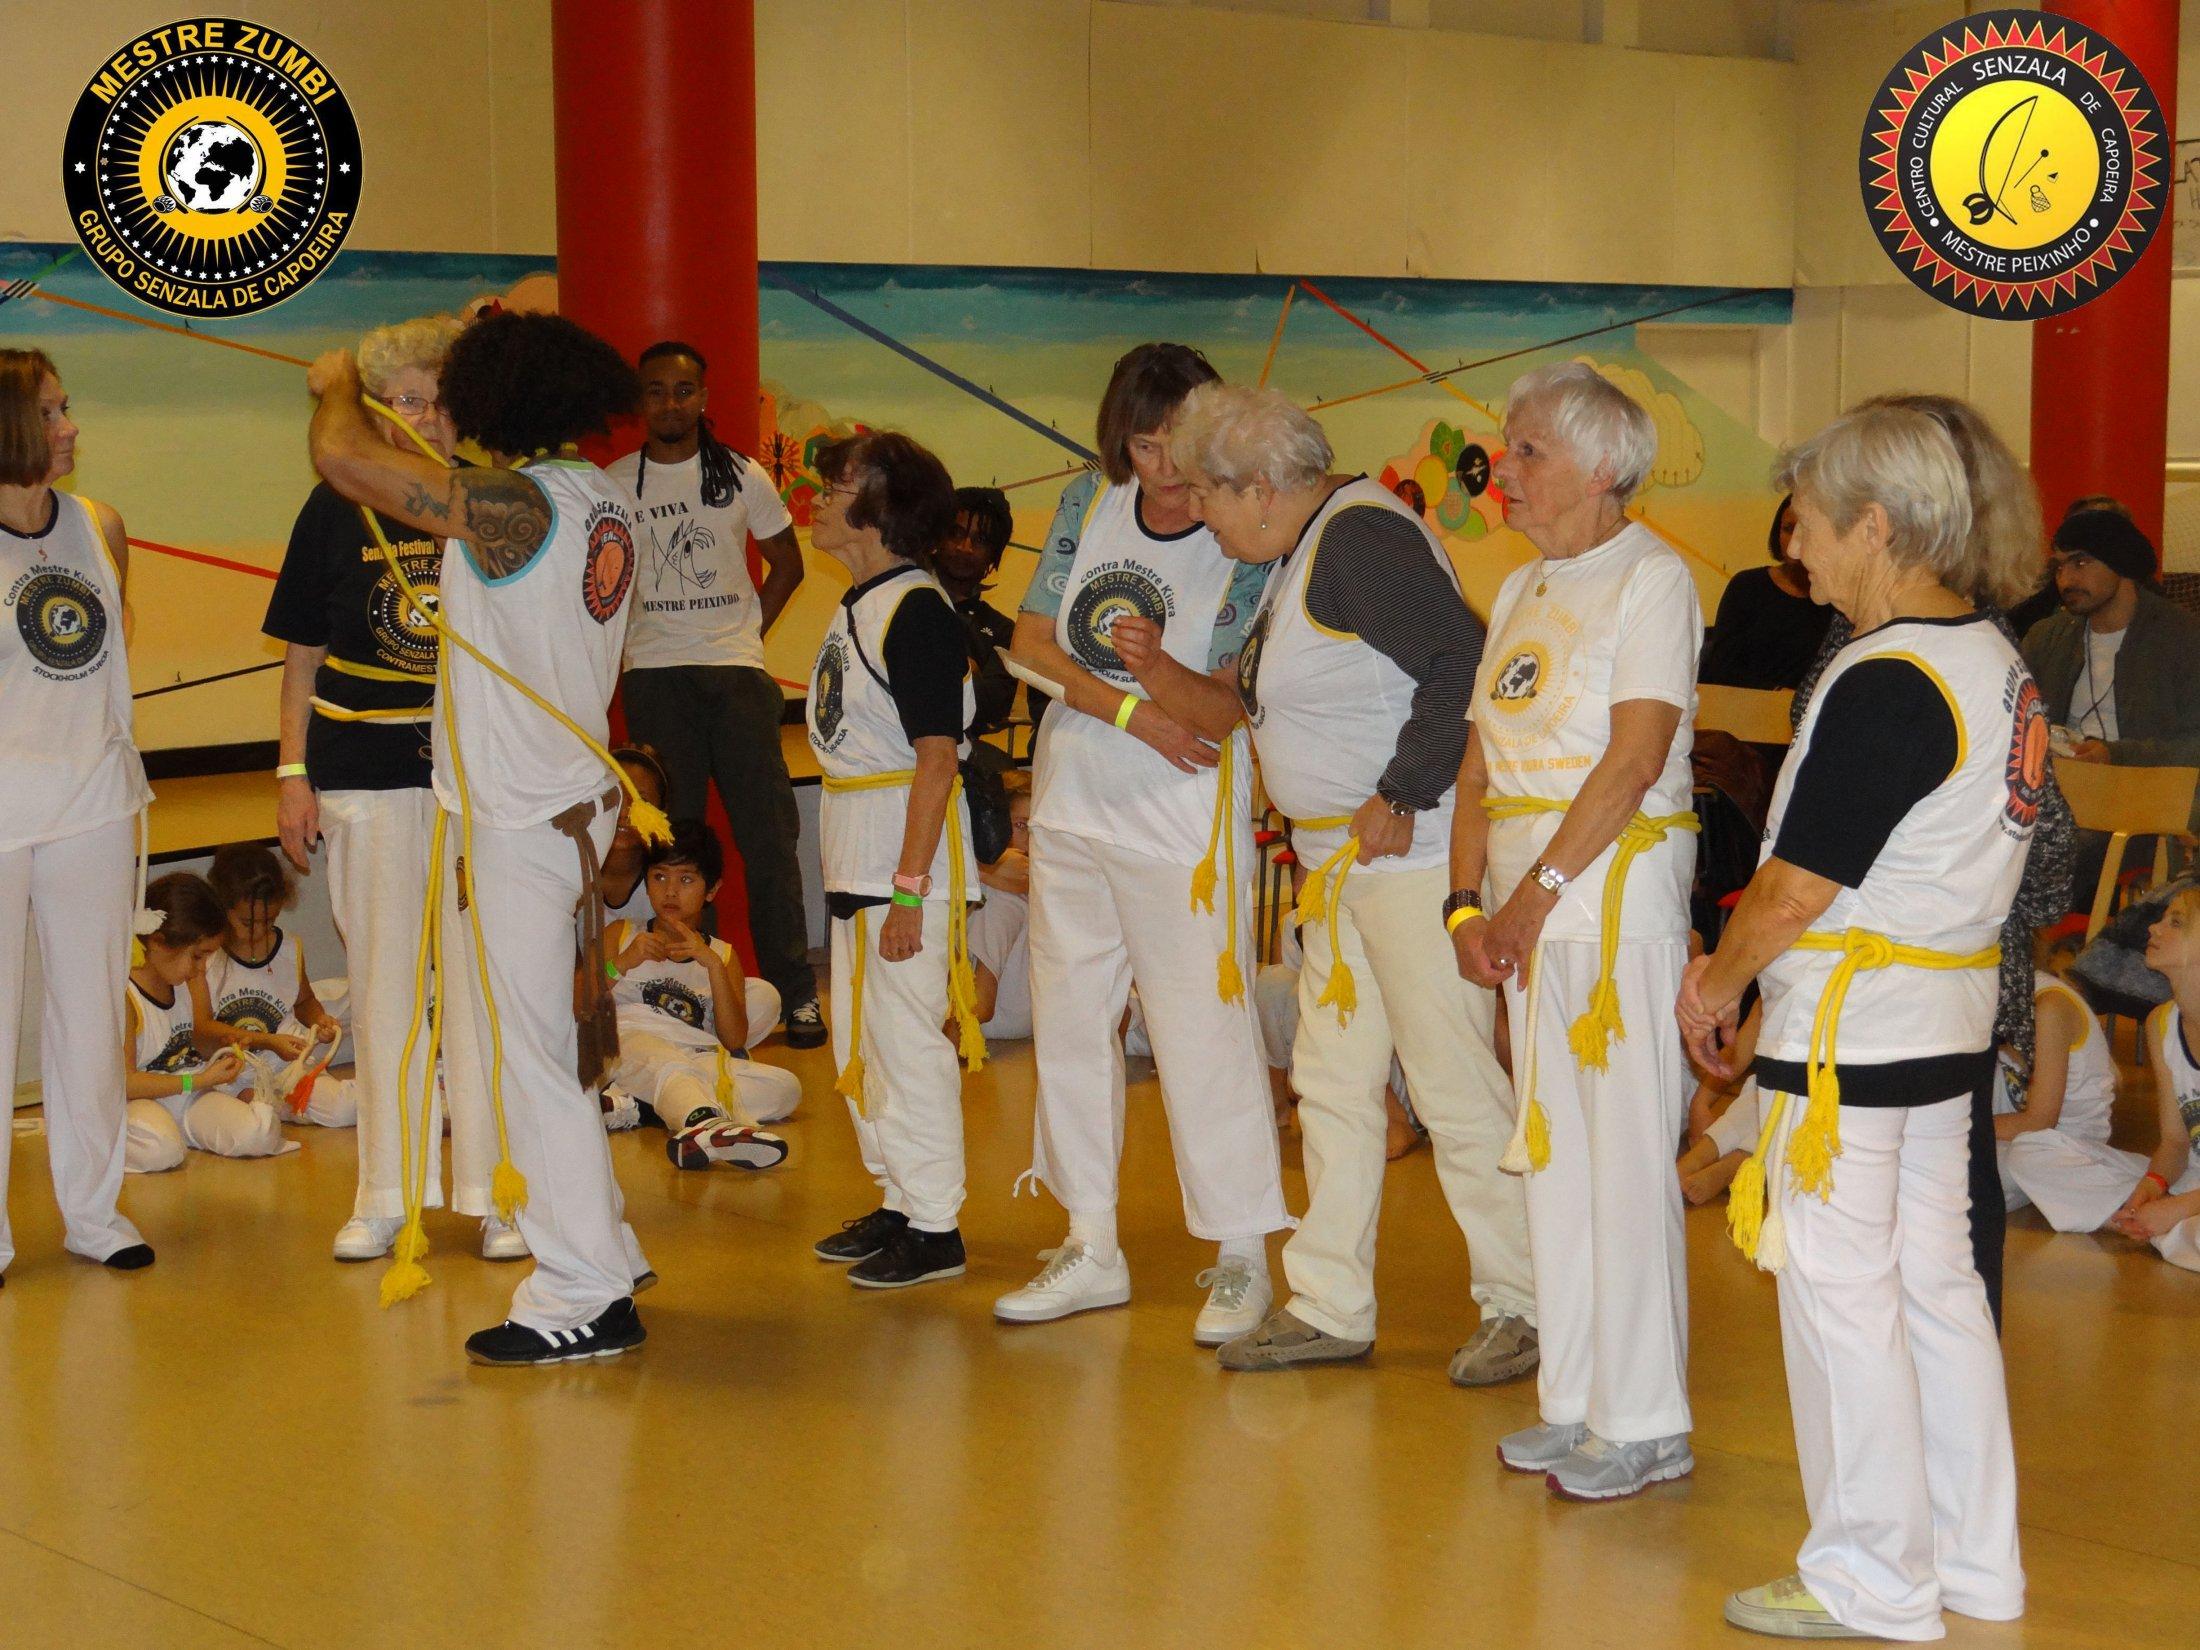 2013-12-14 - Capoeira 055